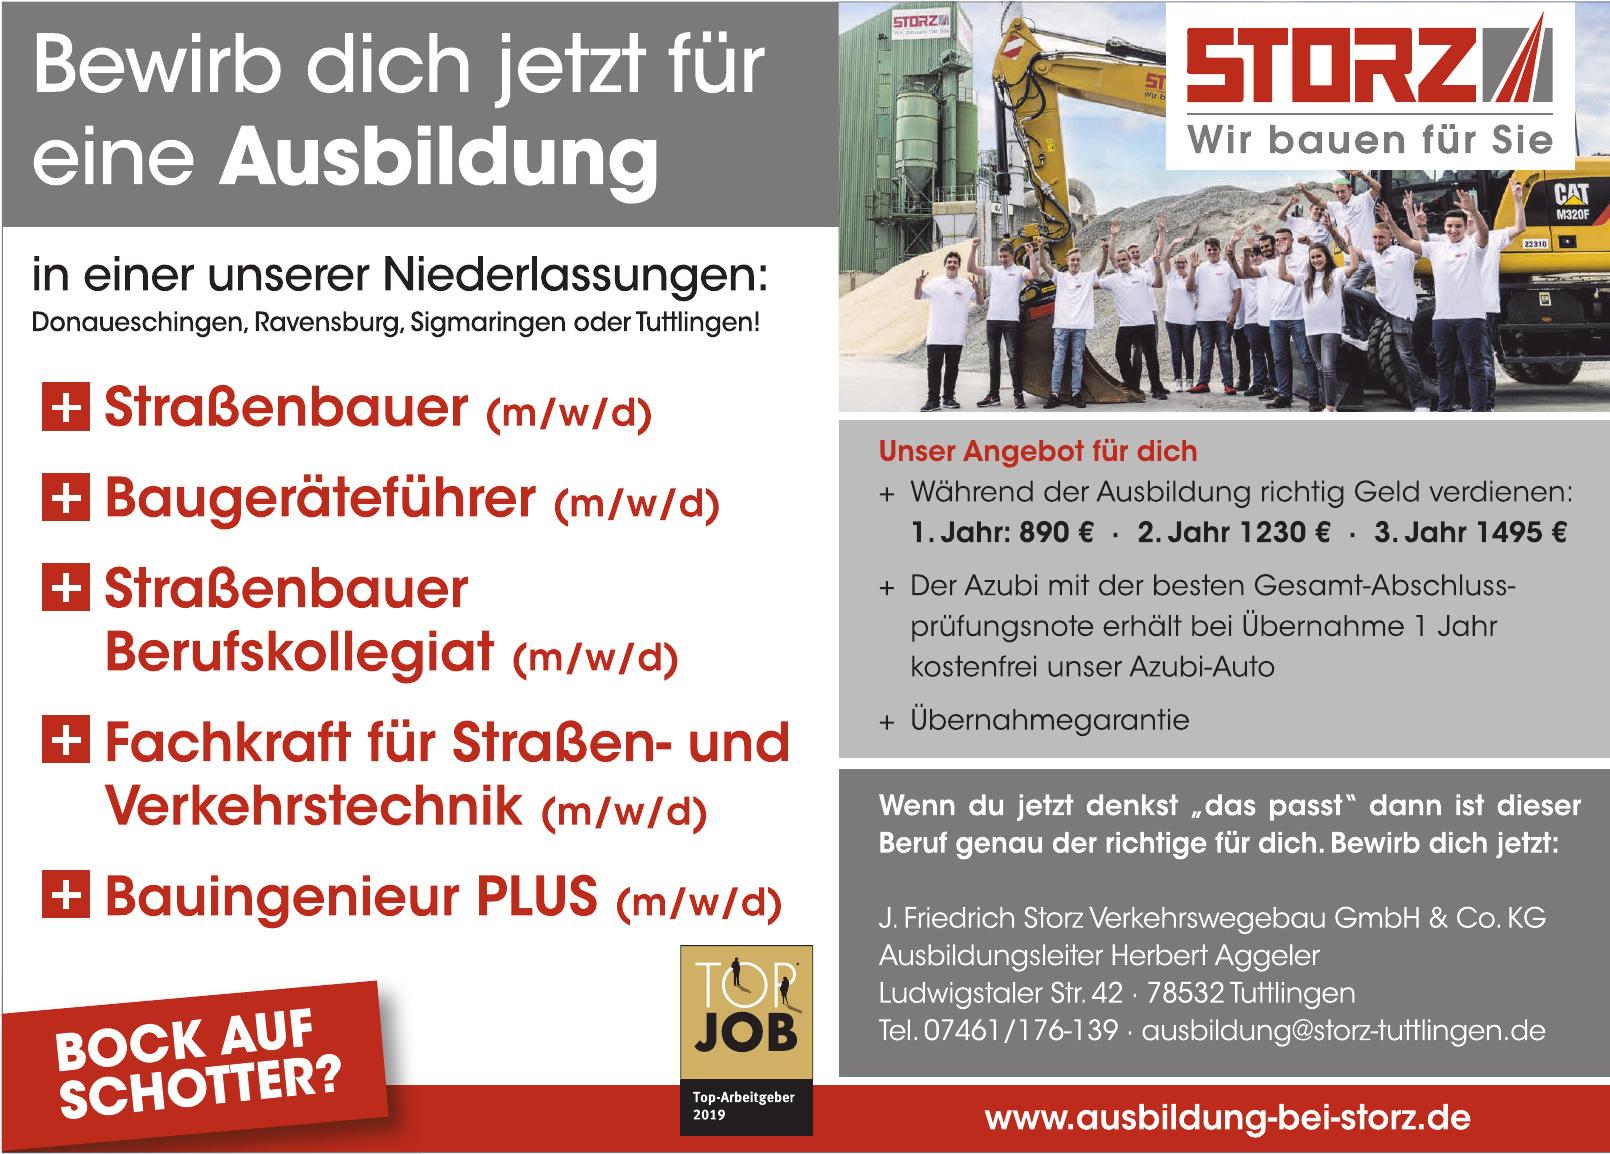 J. Friedrich Storz Verkehrsbau GmbH & Co. KG